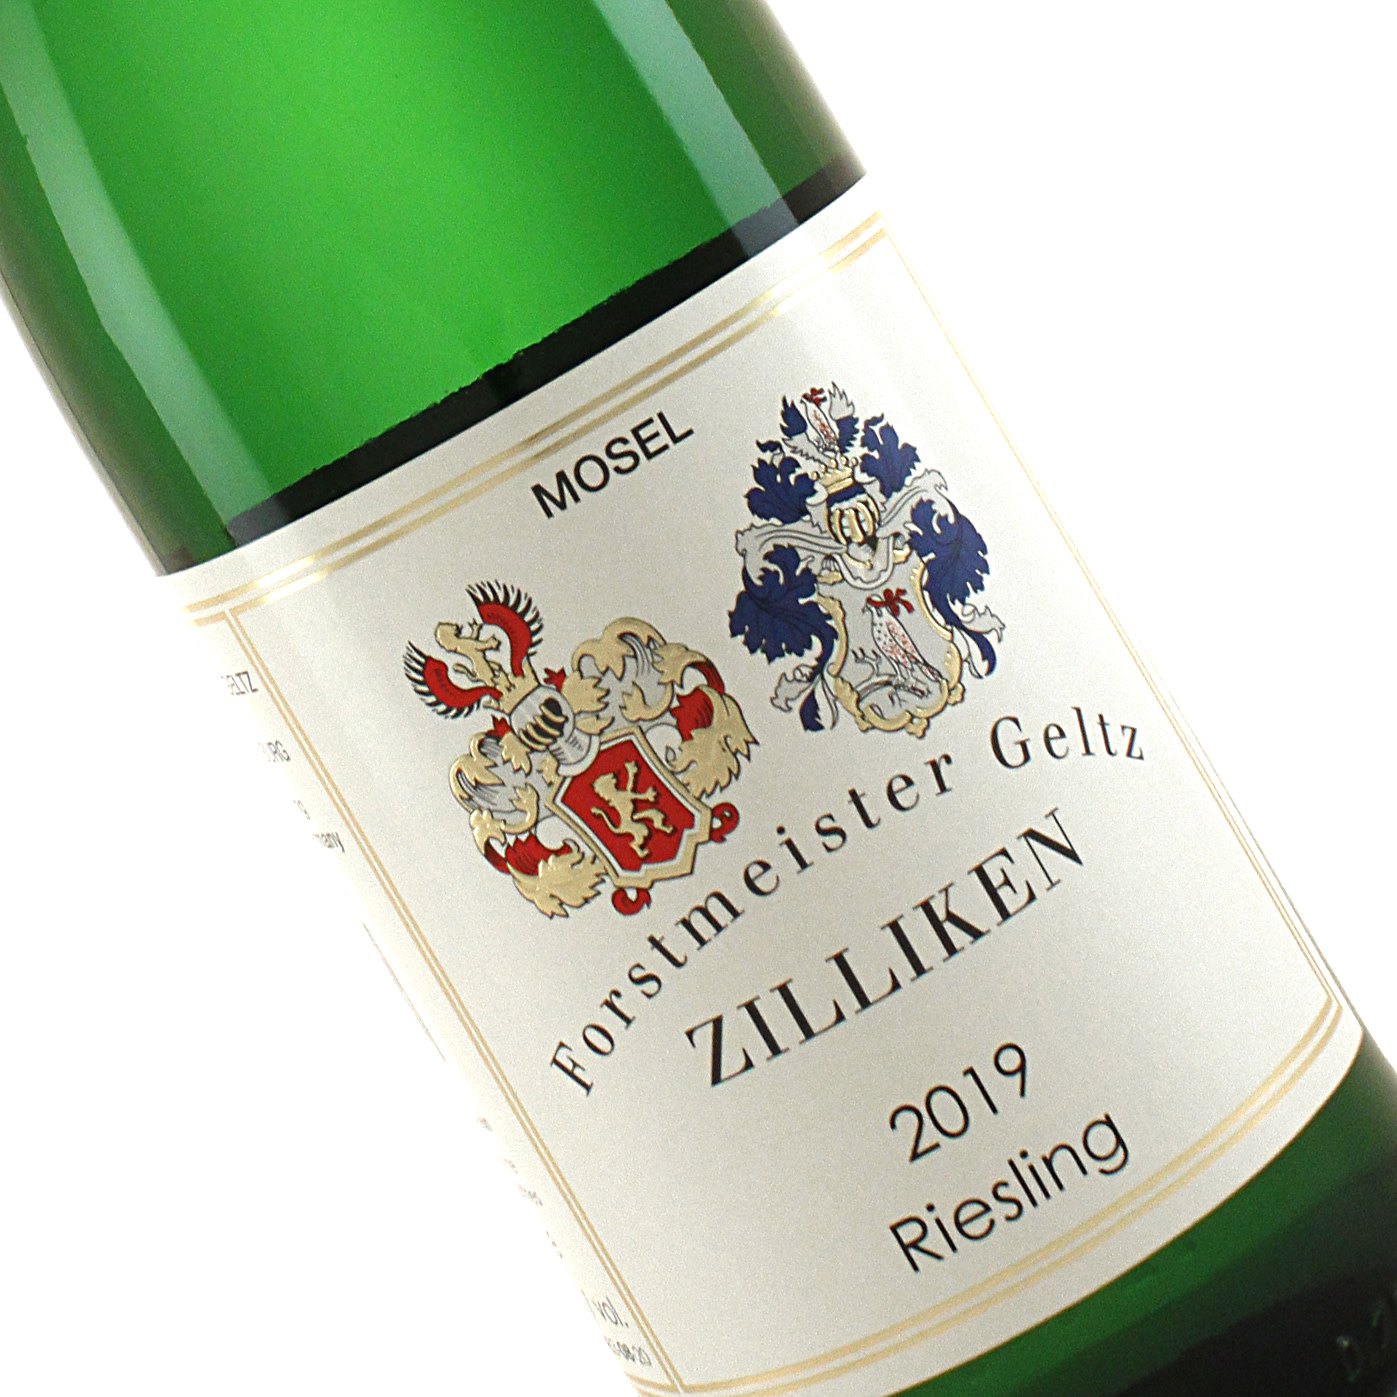 Zilliken 2019 Estate Riesling, Mosel Germany